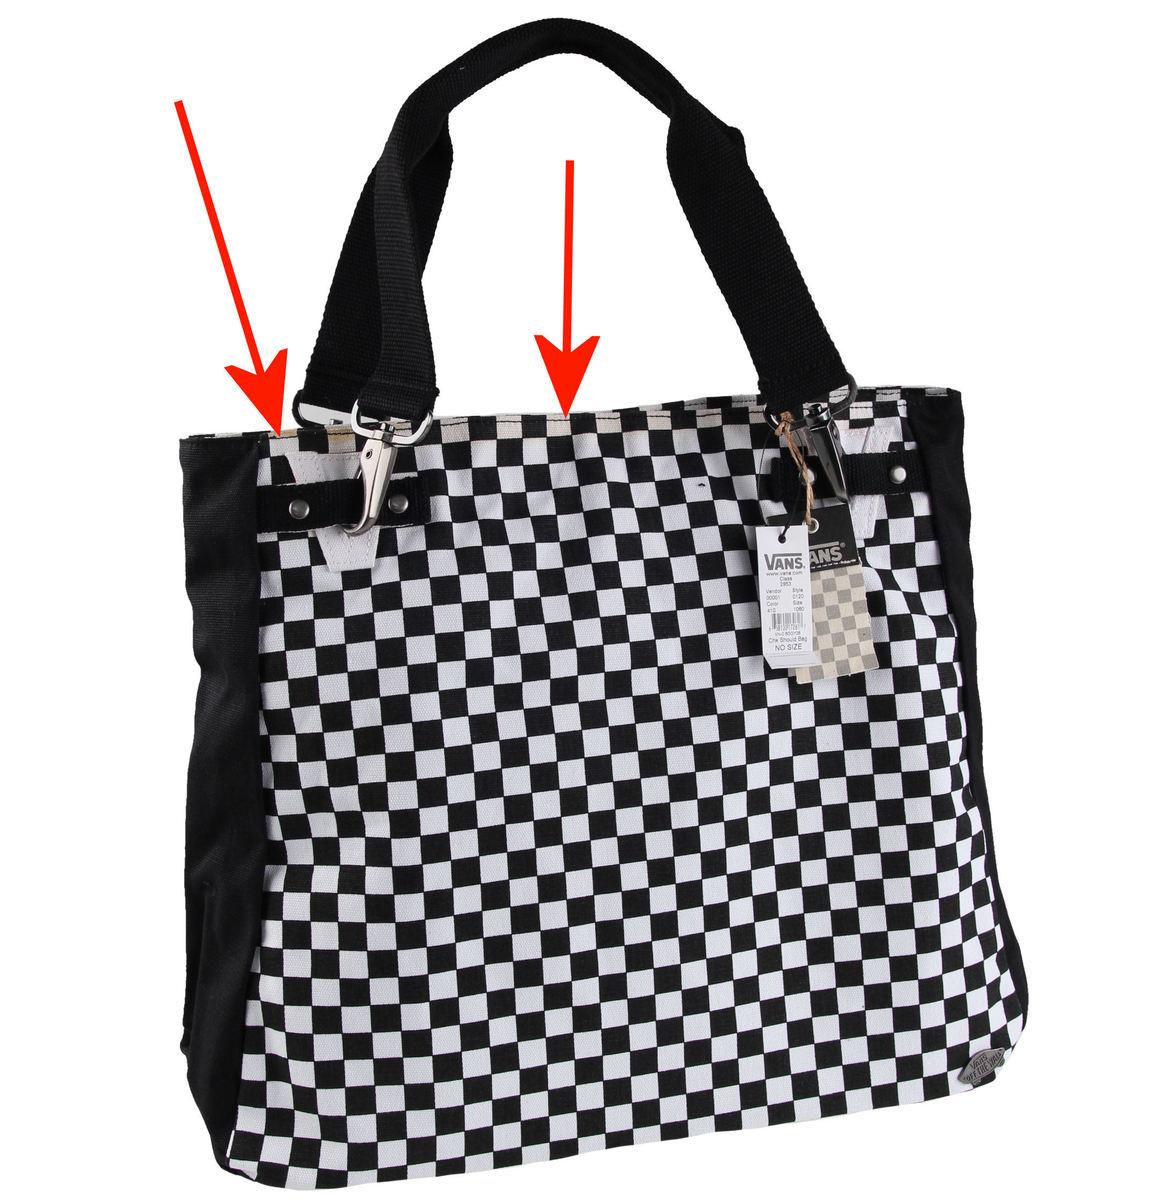 kabelka , taška VANS - Chk Should Bag - Black/White - POŠKOZENÁ - N521